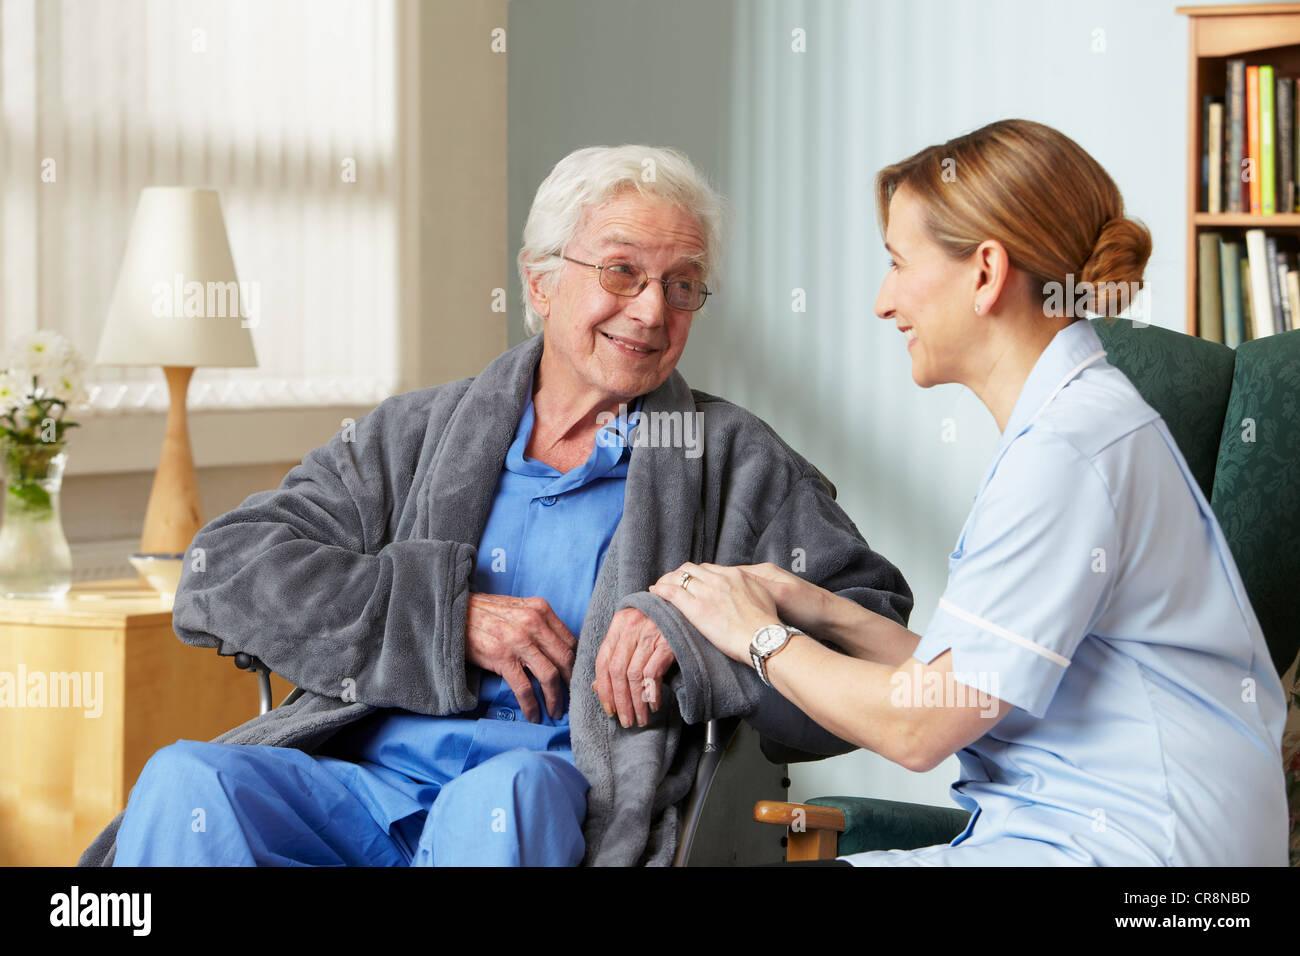 Carer touching senior mans arm - Stock Image